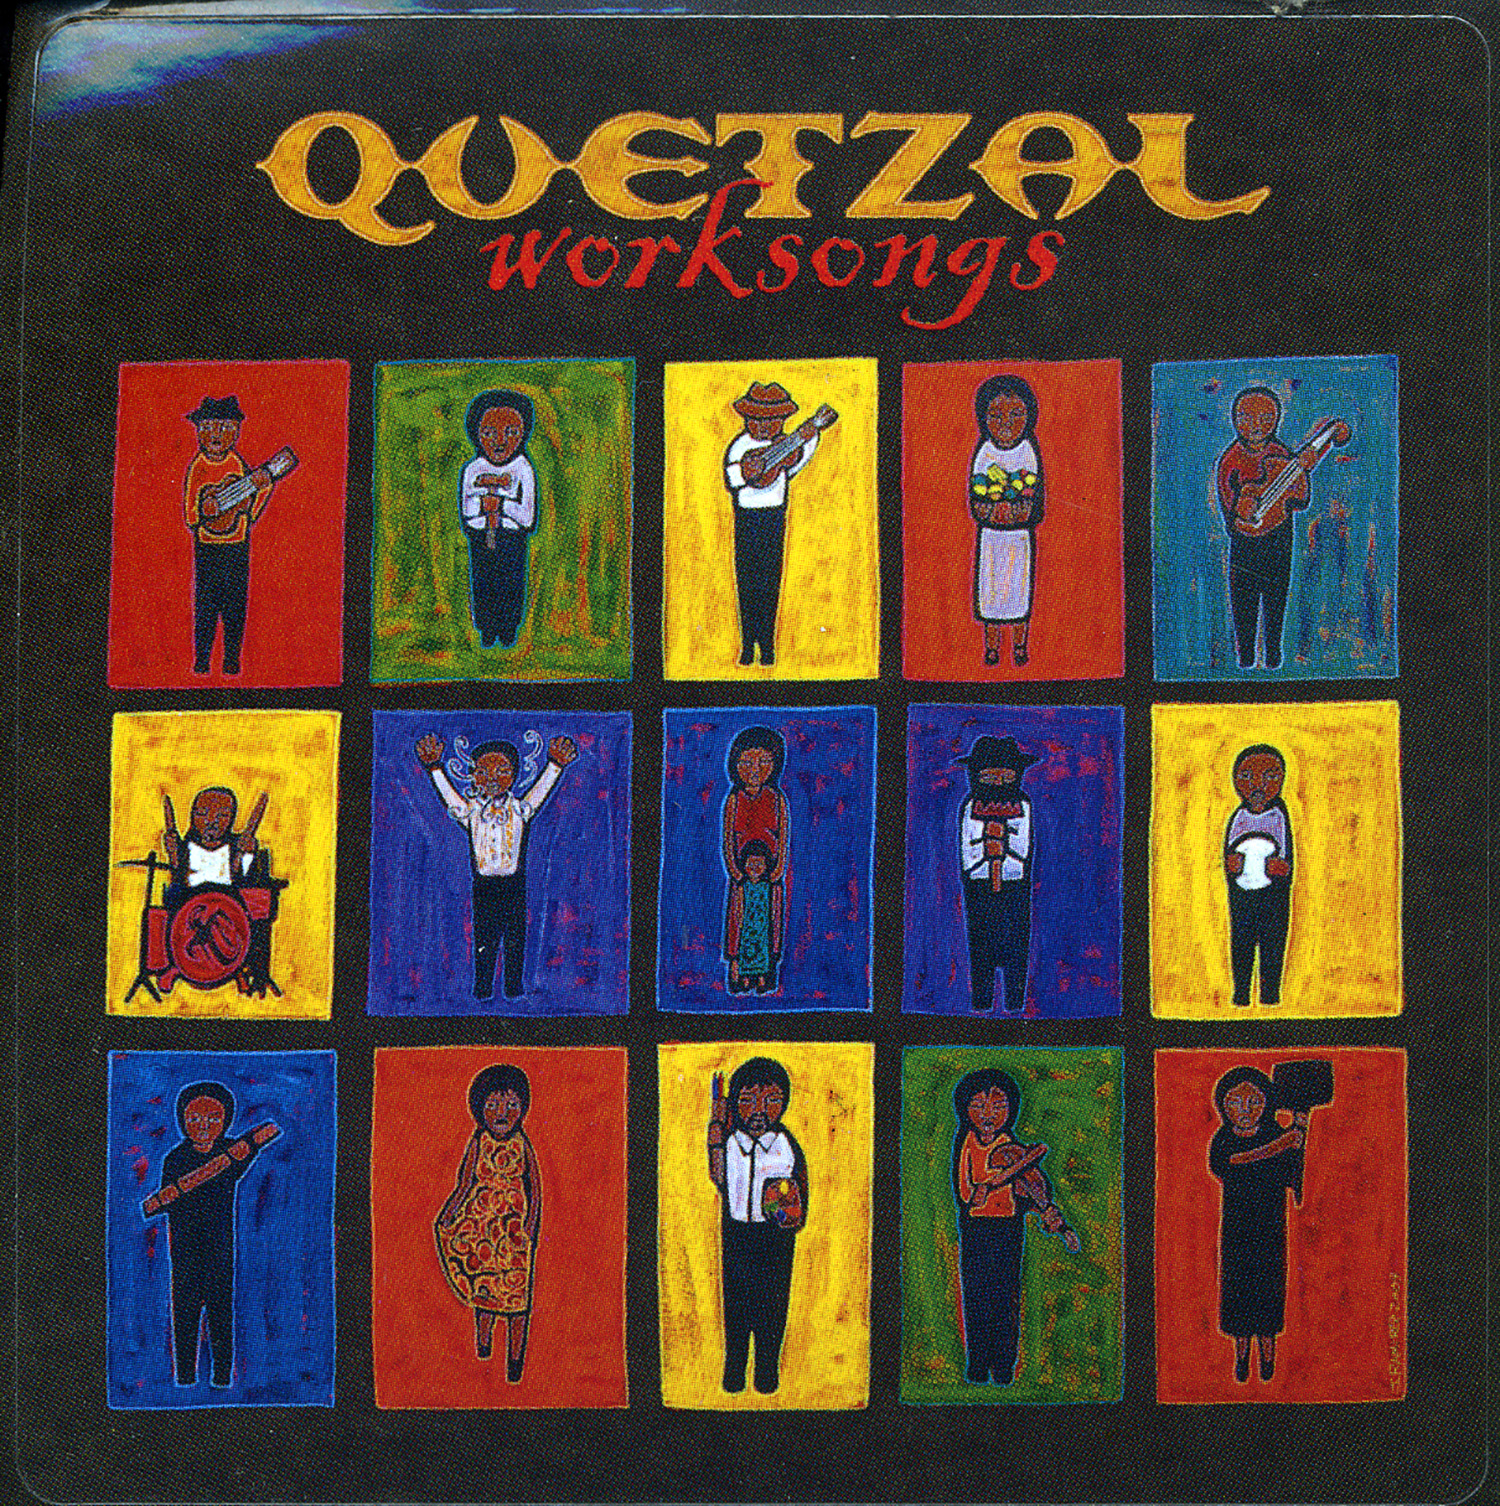 Worksongs, Quetzal album cover, 2003.